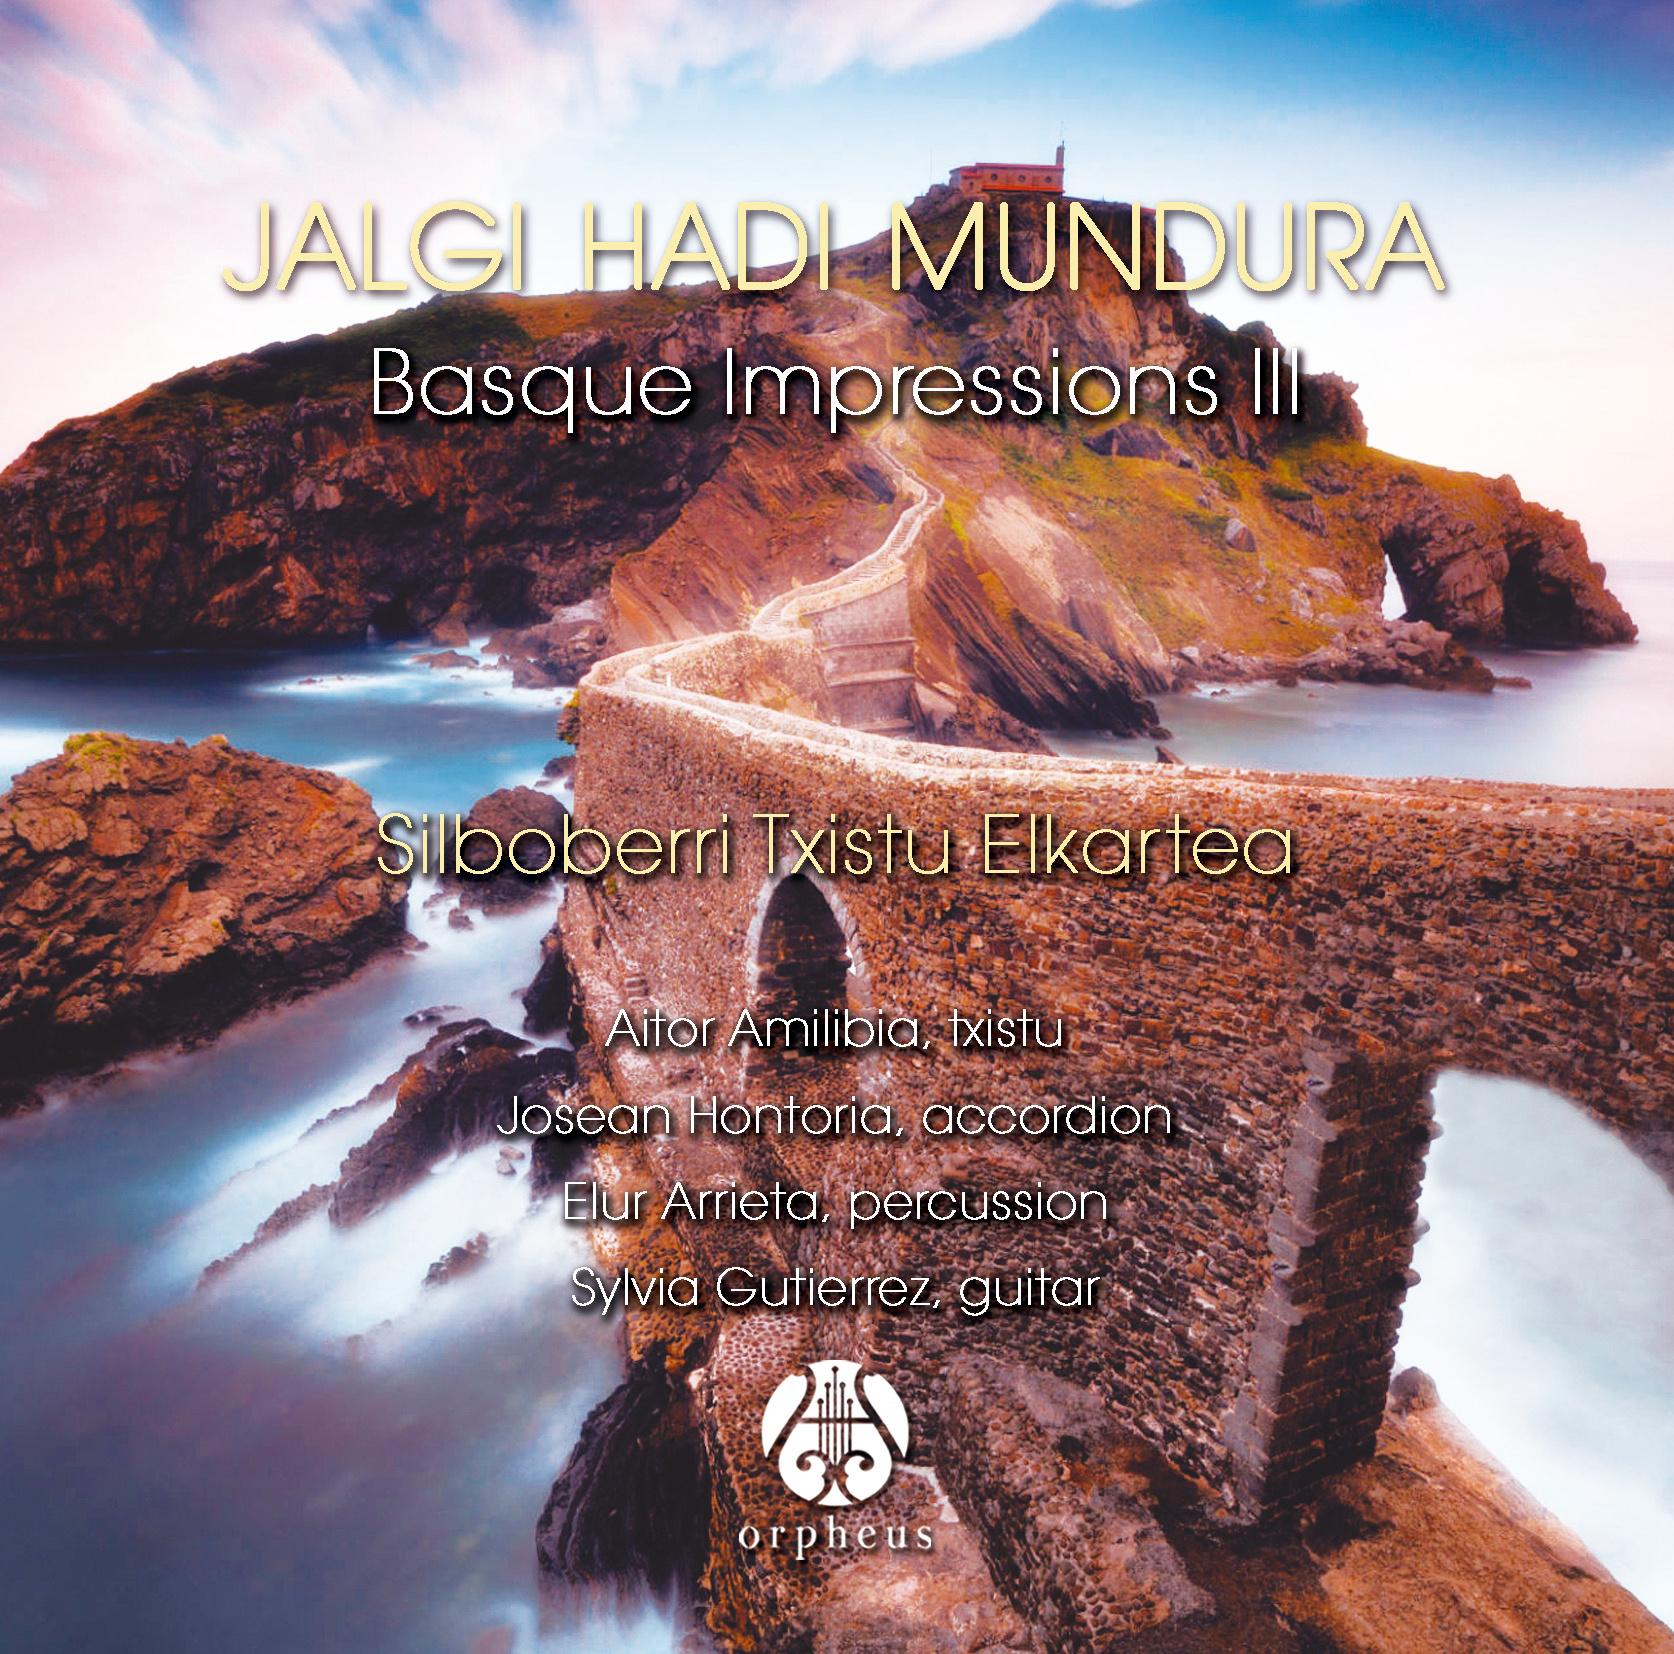 Basque Impressions III